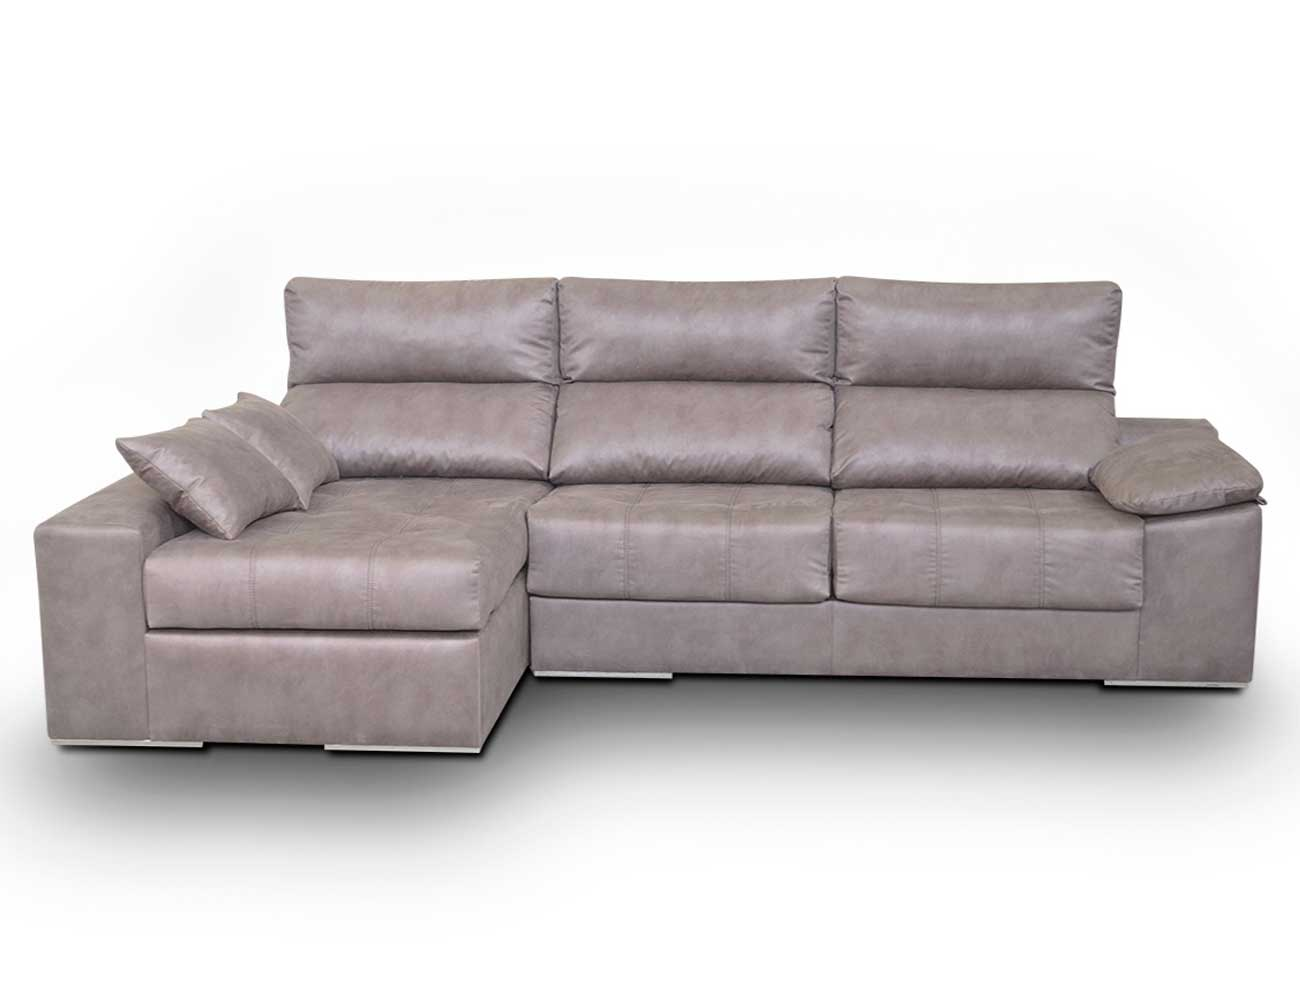 4938_sofa chaiselongue moderno asientos extraibles muy comodo dobles pespuntes donatella9